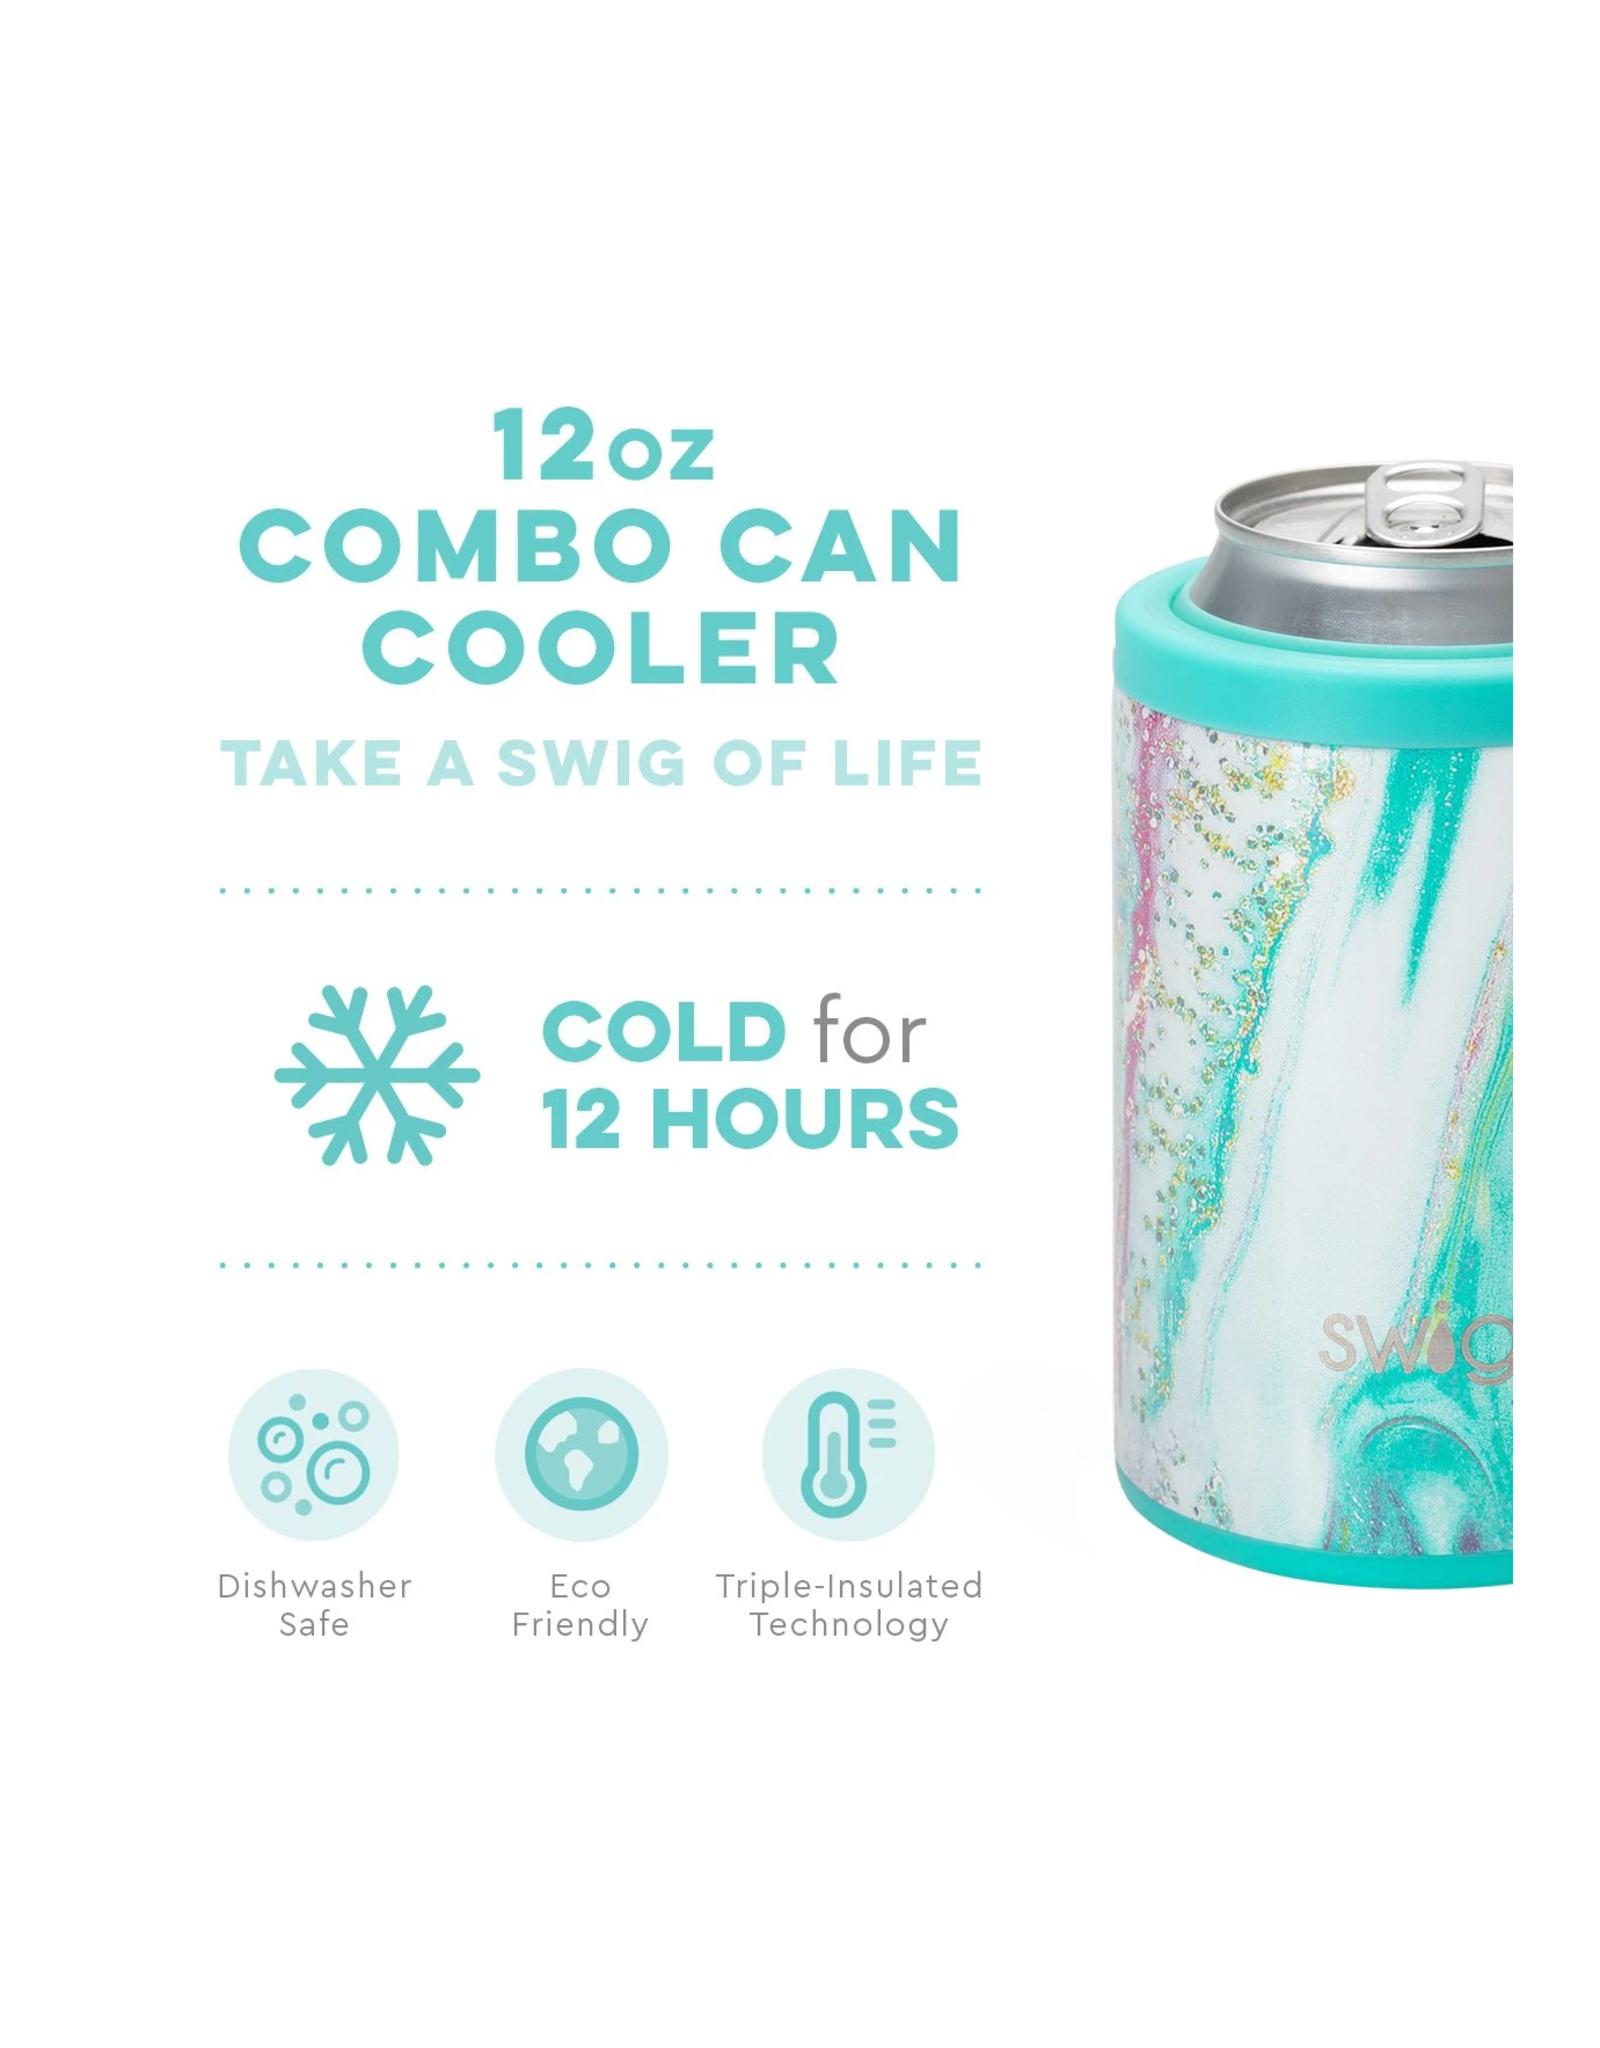 12oz Combo Cooler - Wanderlust